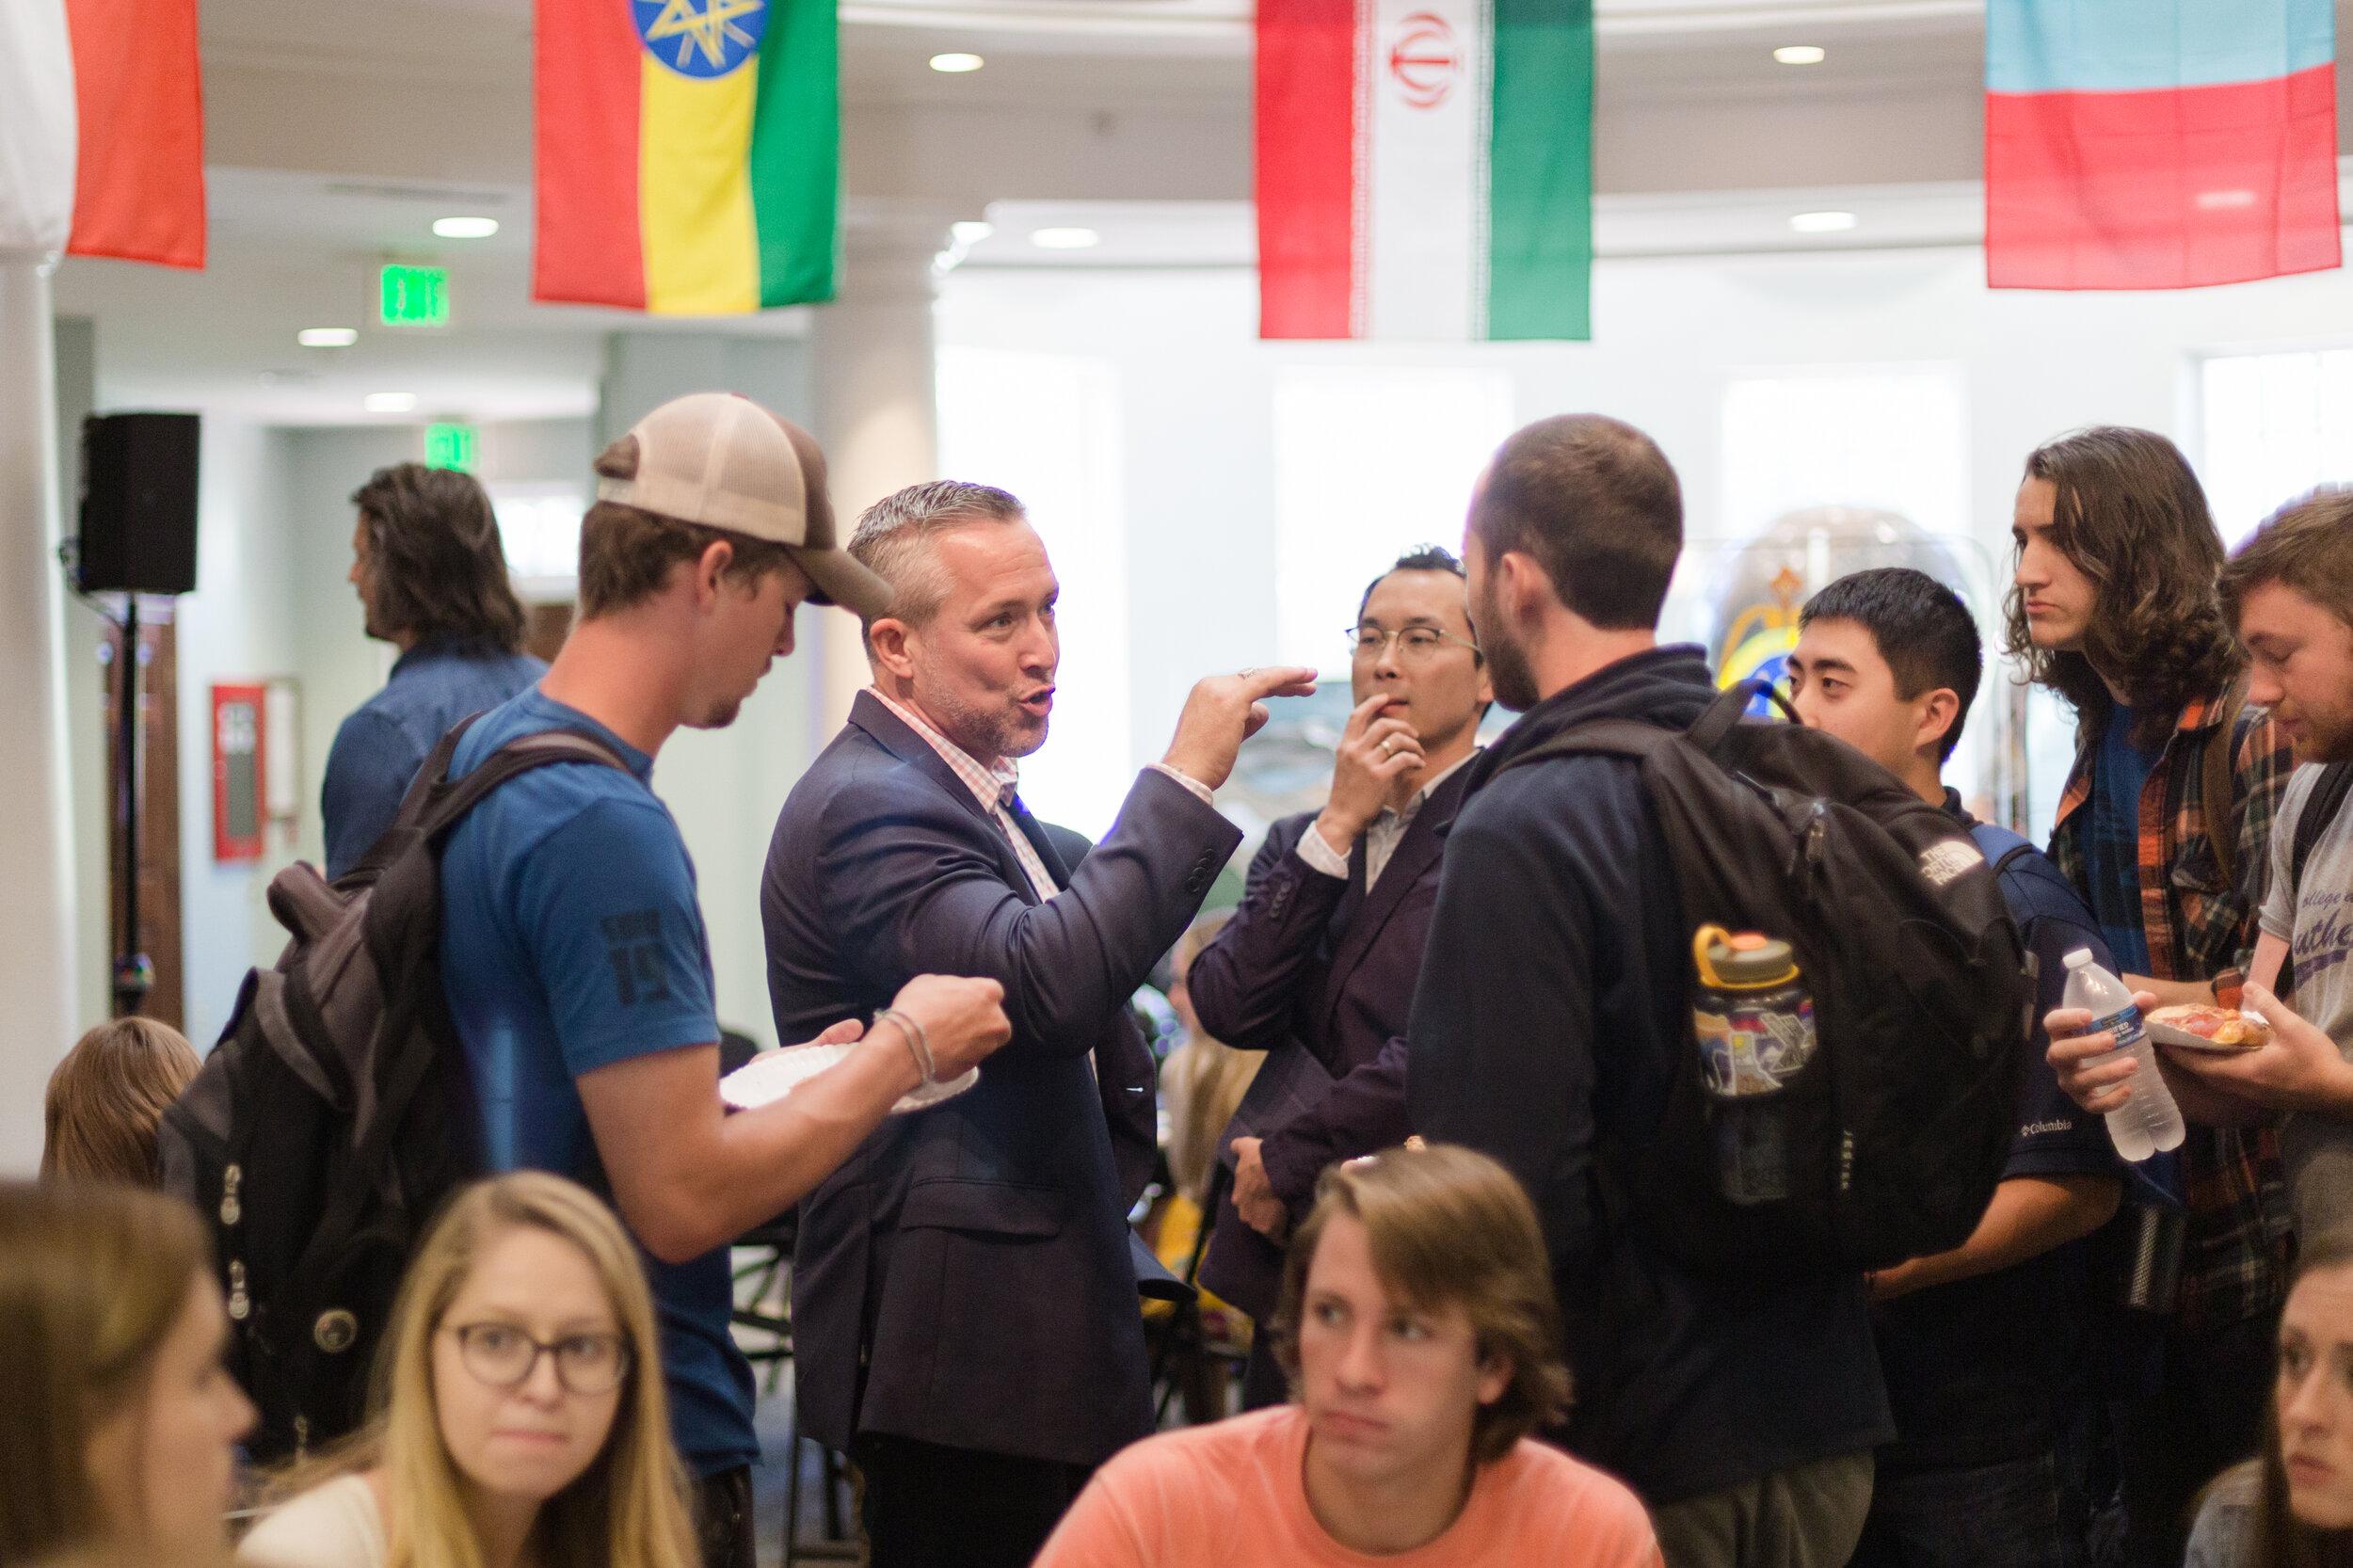 Summit_LunchandLearn_JDGreear_CGCS_082919_4 copy.jpg